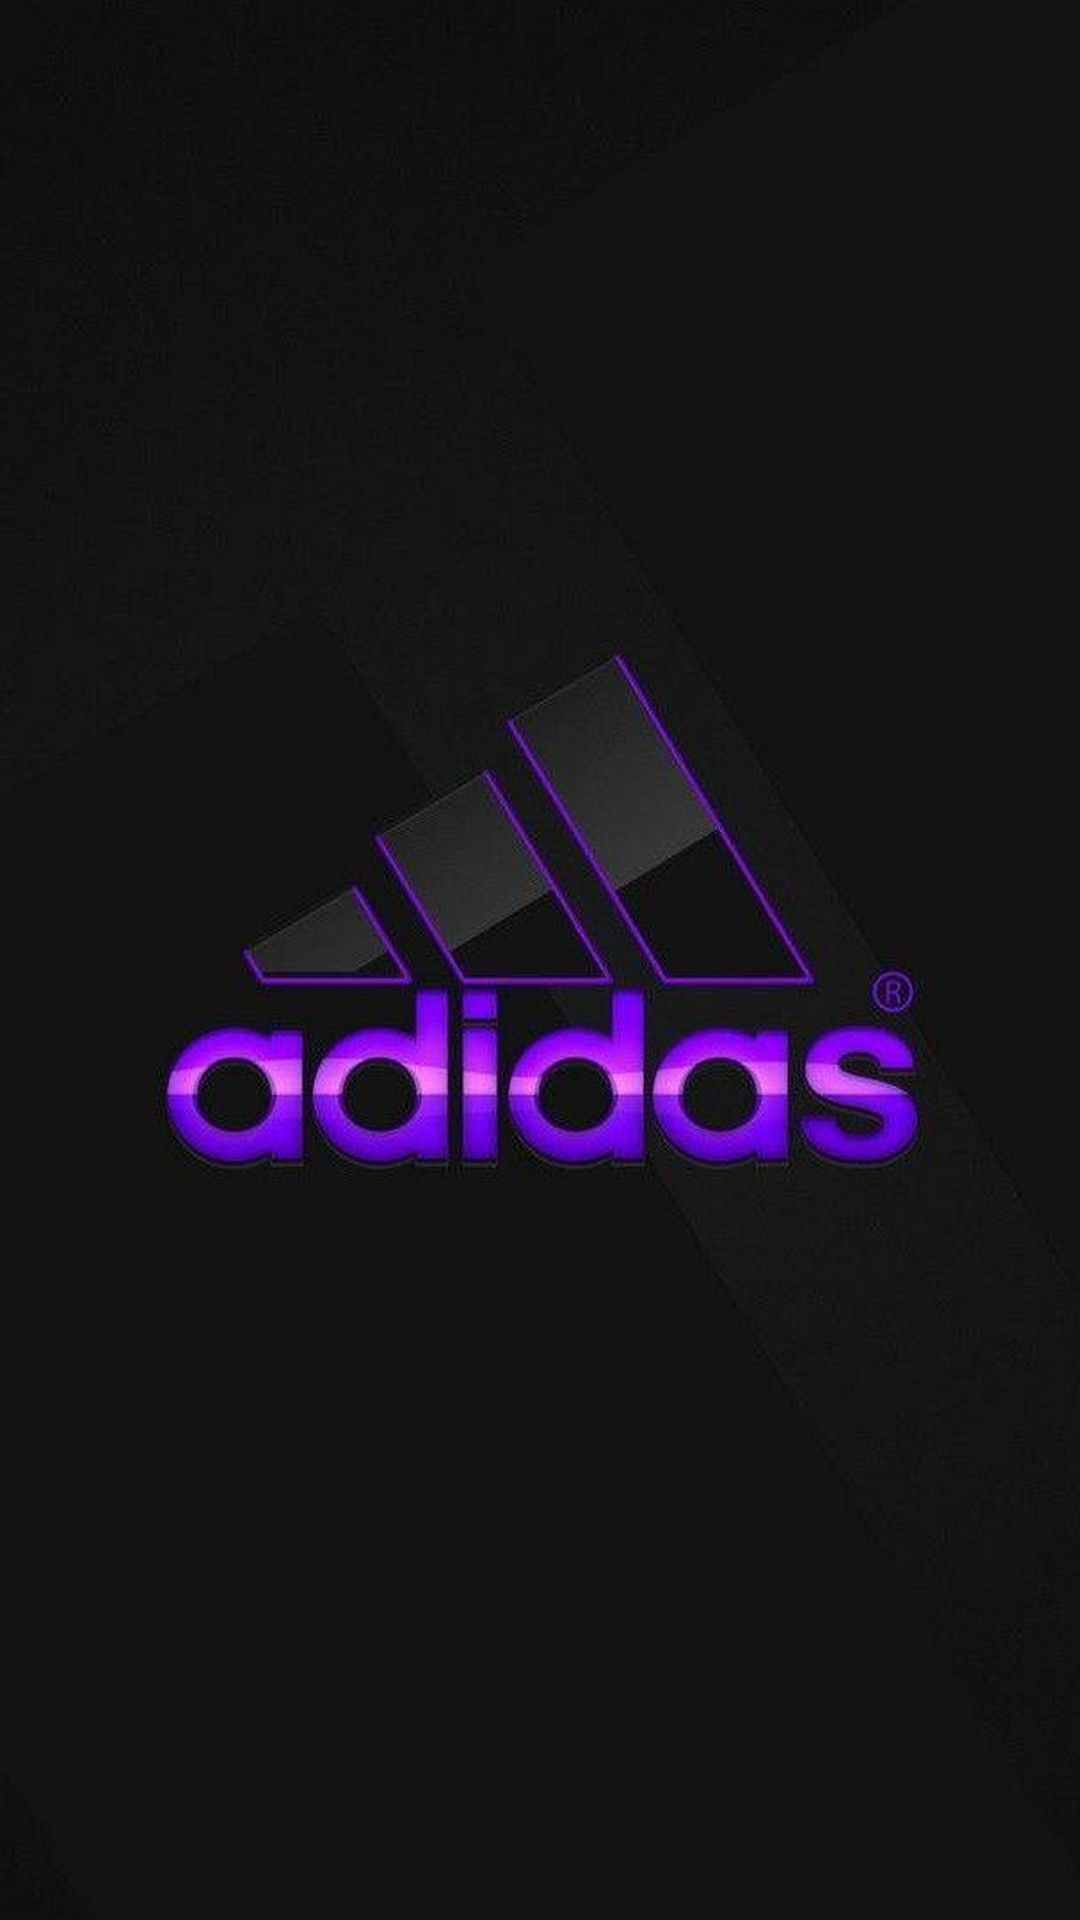 Adidas Iphone Wallpapers On Wallpaperdog